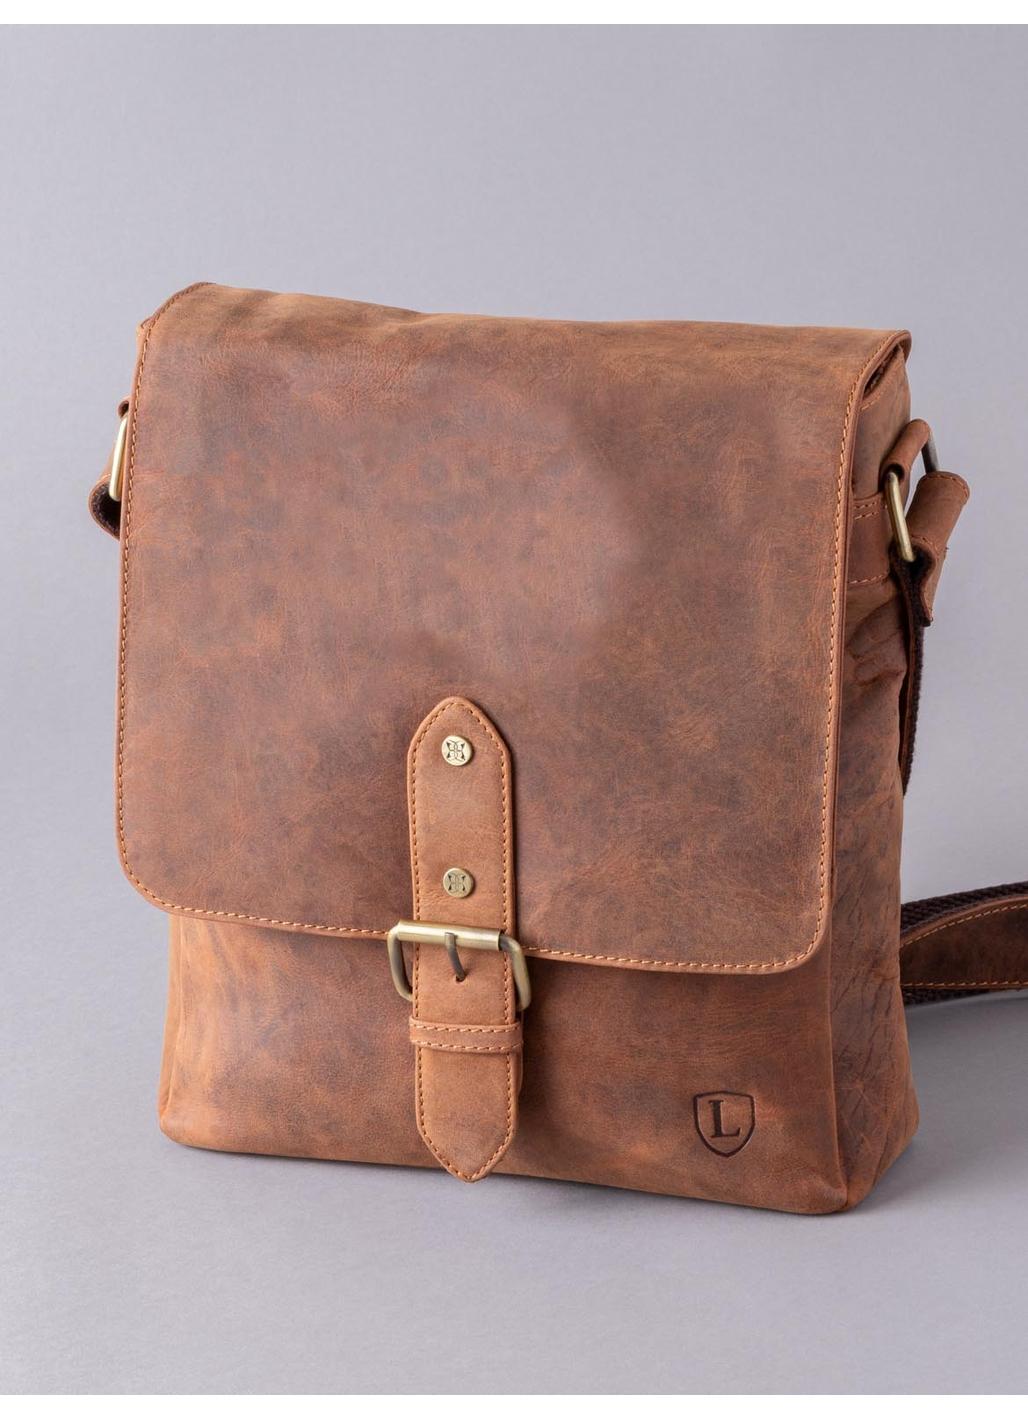 Hunter Leather Messenger Bag in Tan